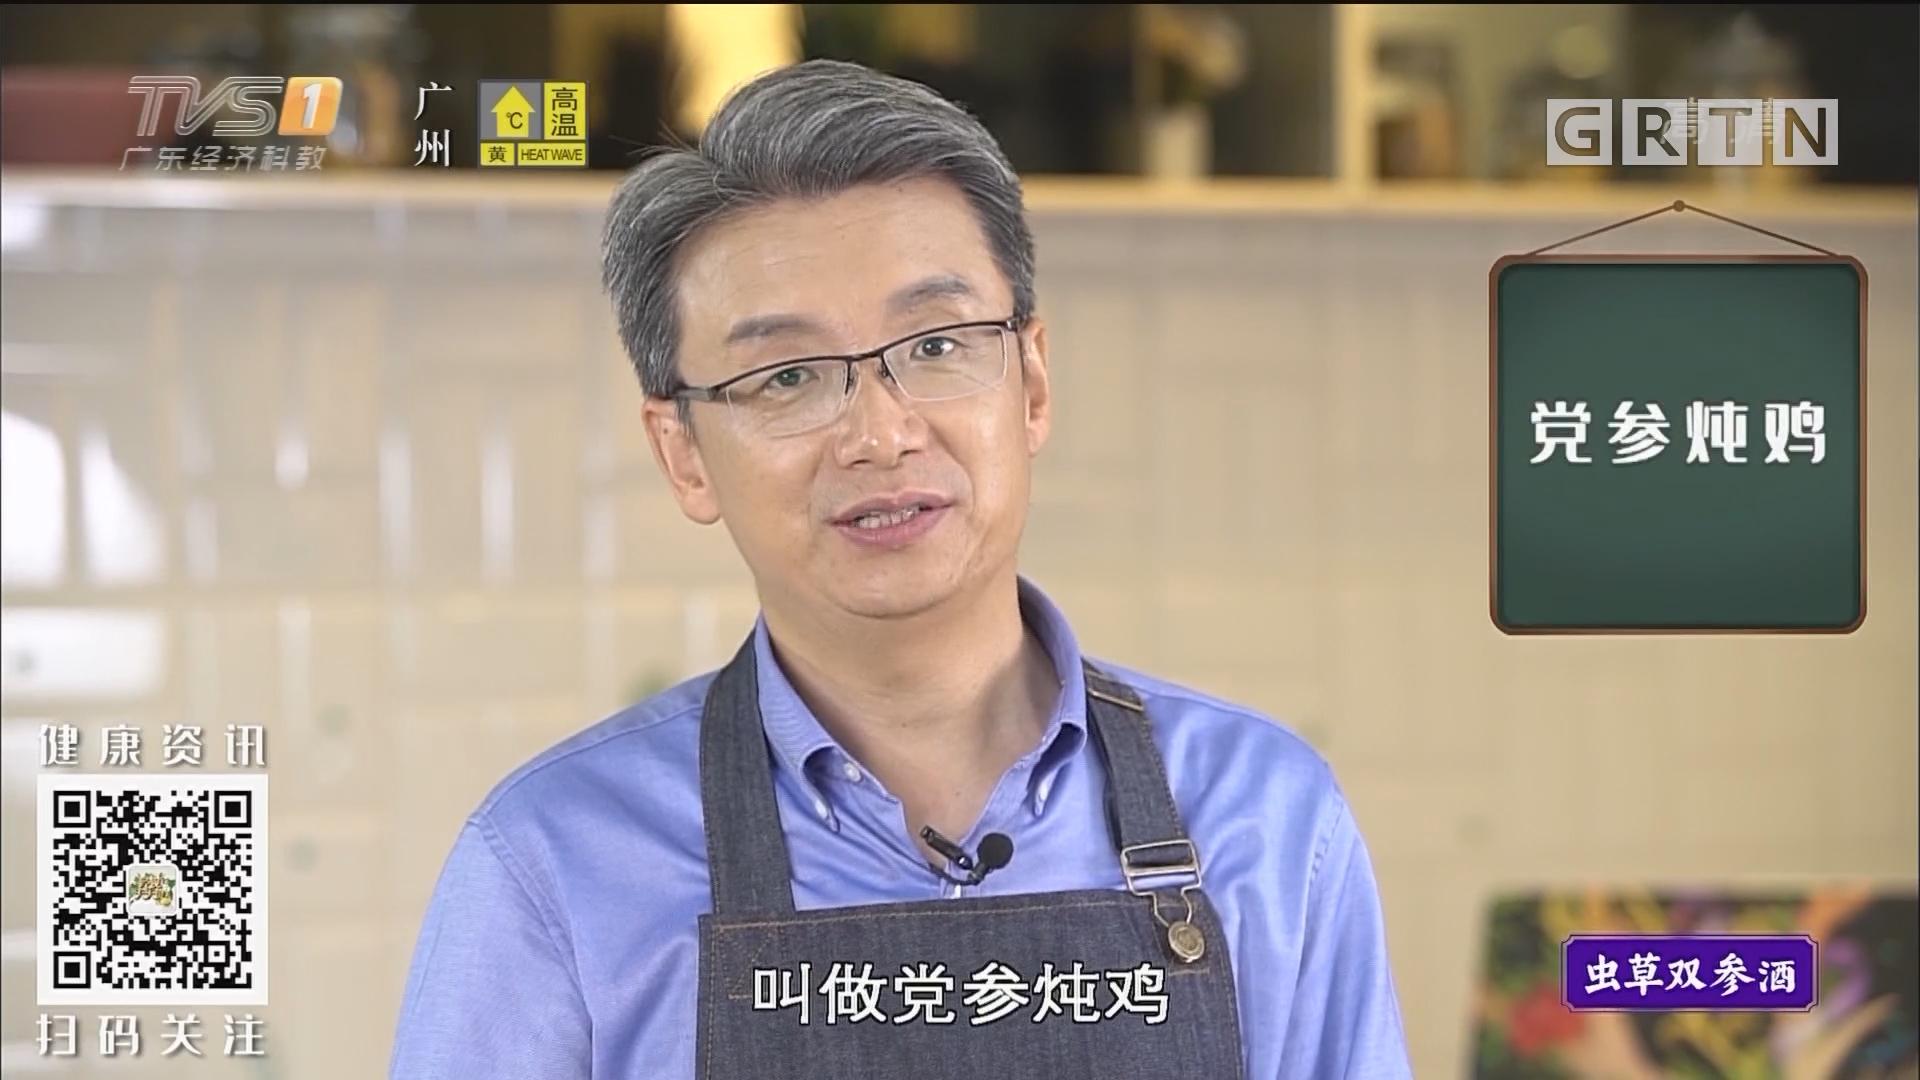 [HD][2019-07-01]经视健康+:名医私房菜:党参炖鸡